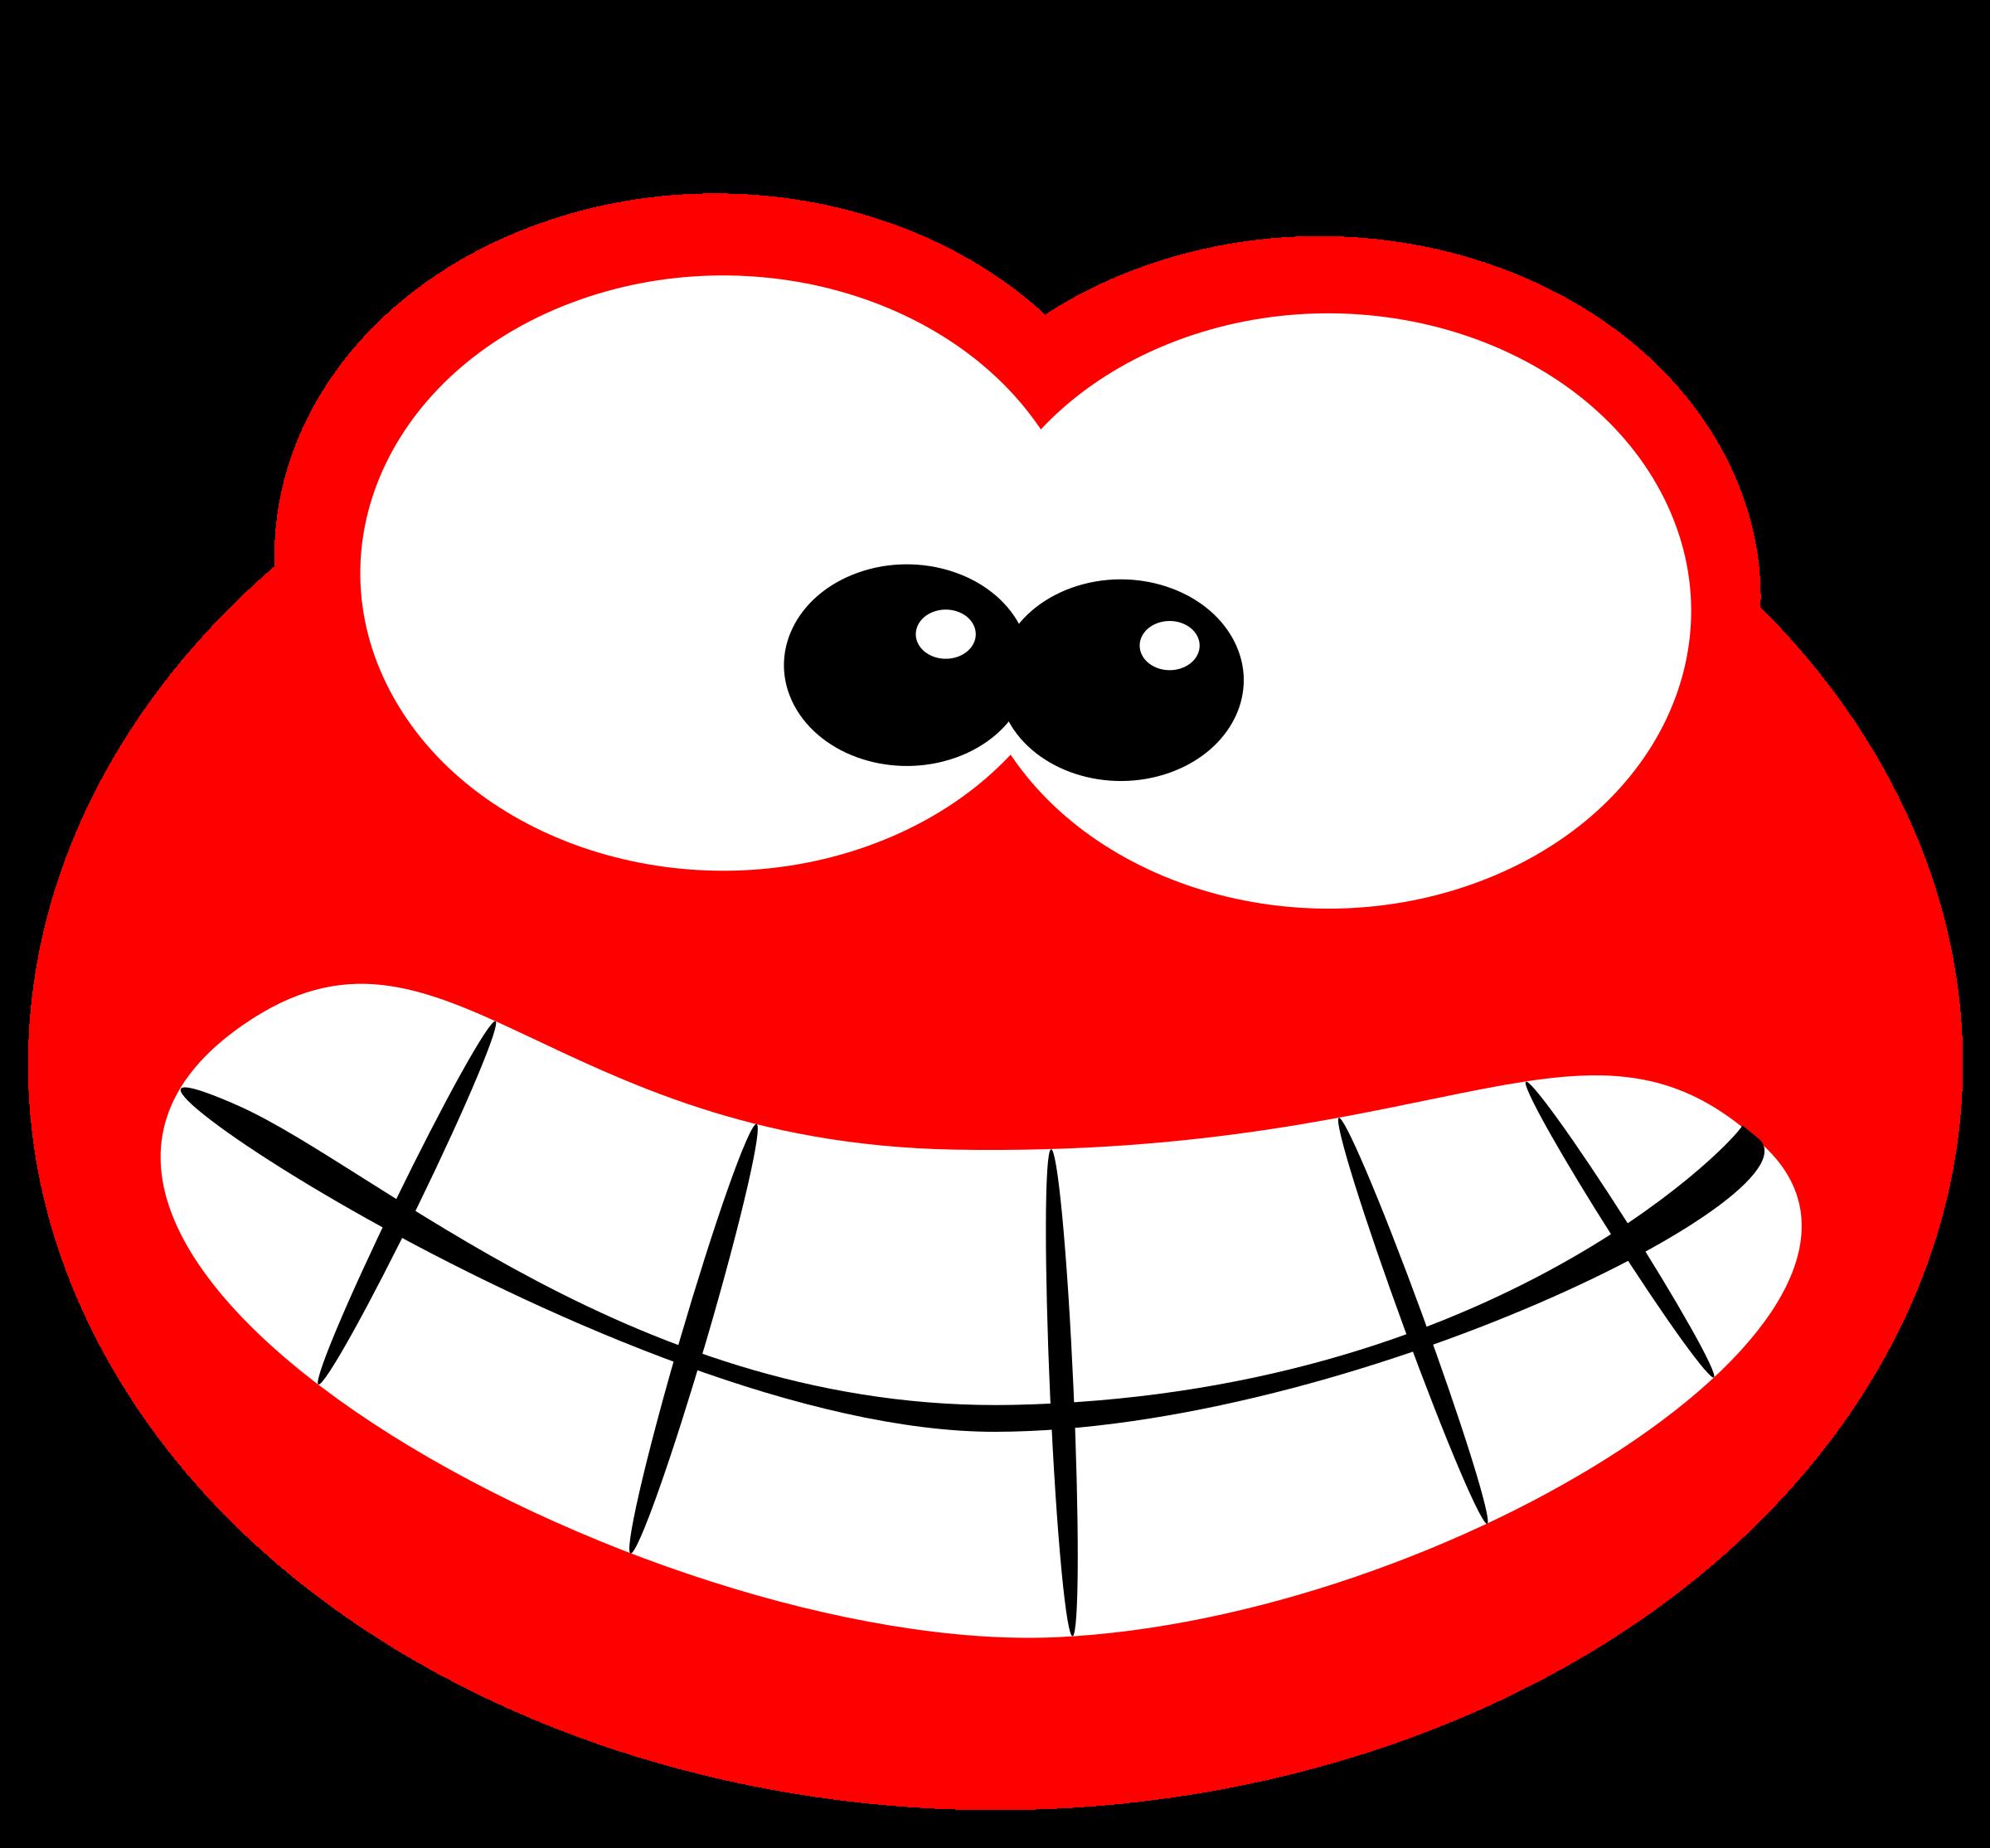 Health clipart dental health. Blob smiling big image